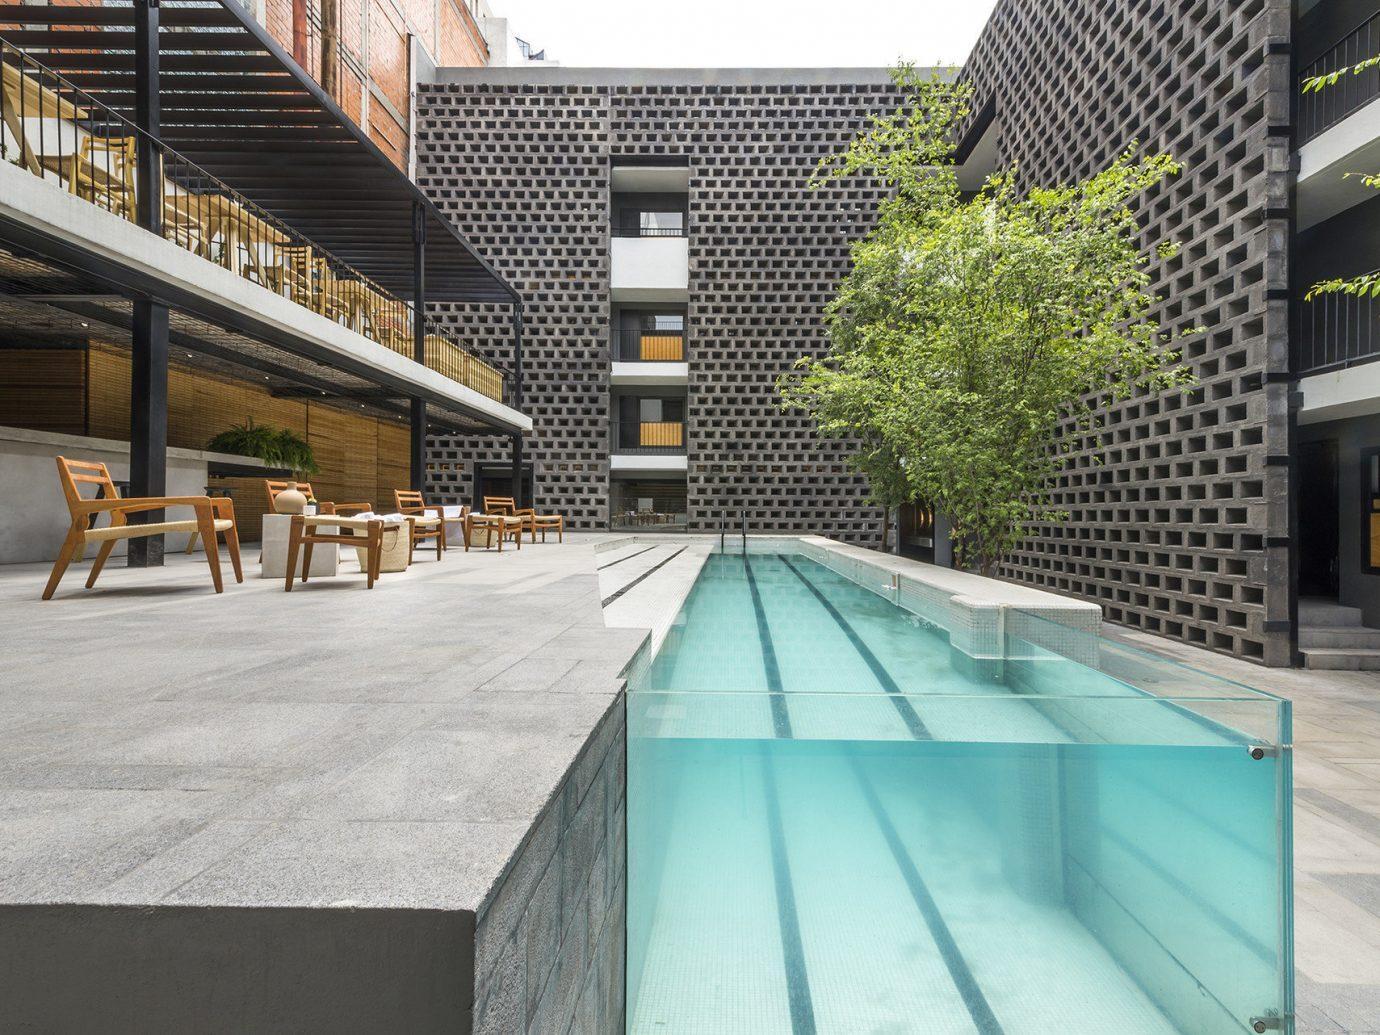 Pool at Hotel Carlota, Mexico City